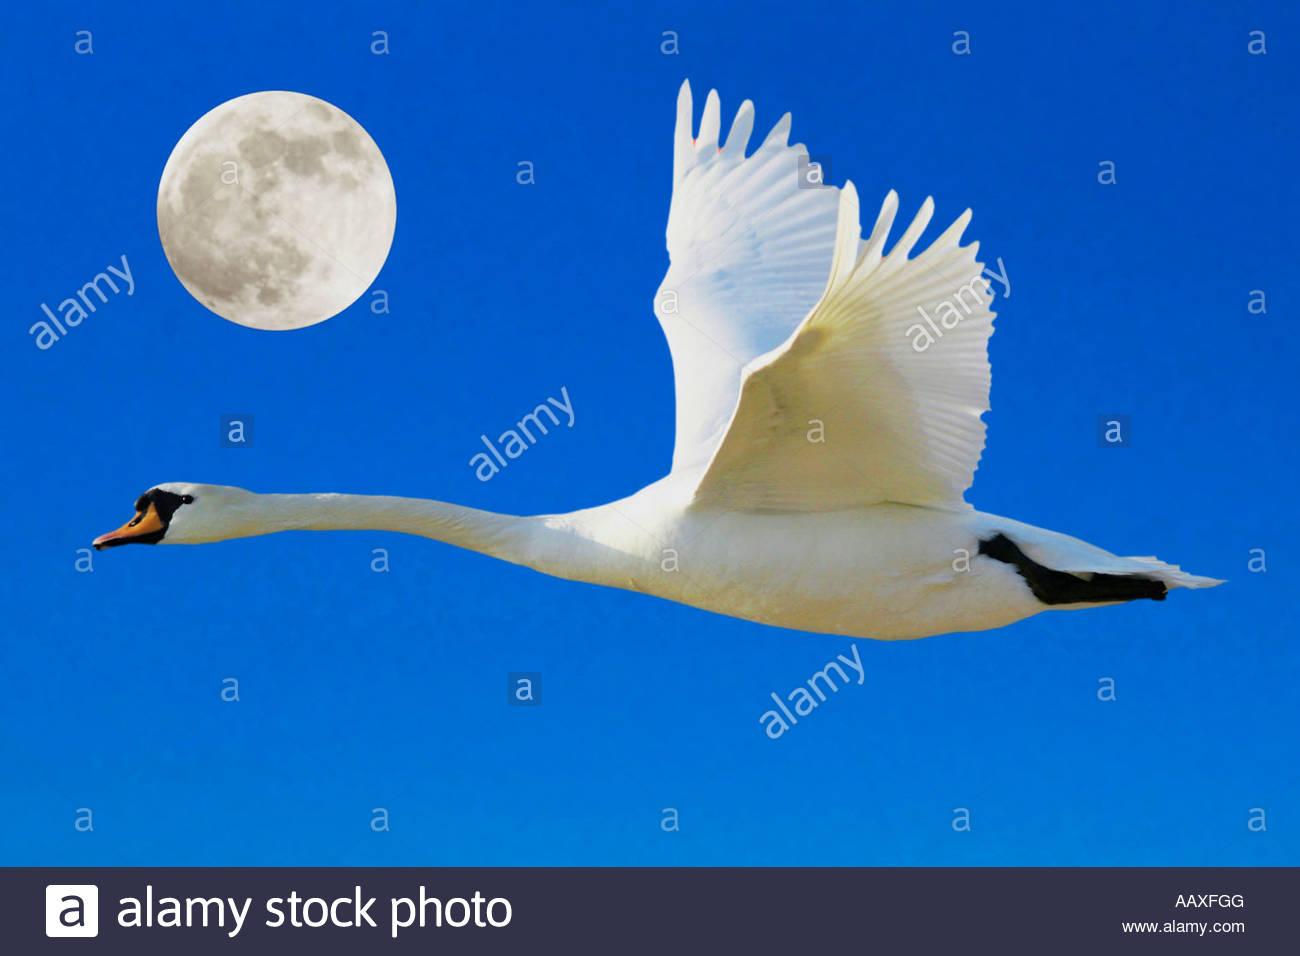 Hoeckerschwan Cygnus olor vor Vollmond mute swan Cygnus olor full moon Composing - Stock Image